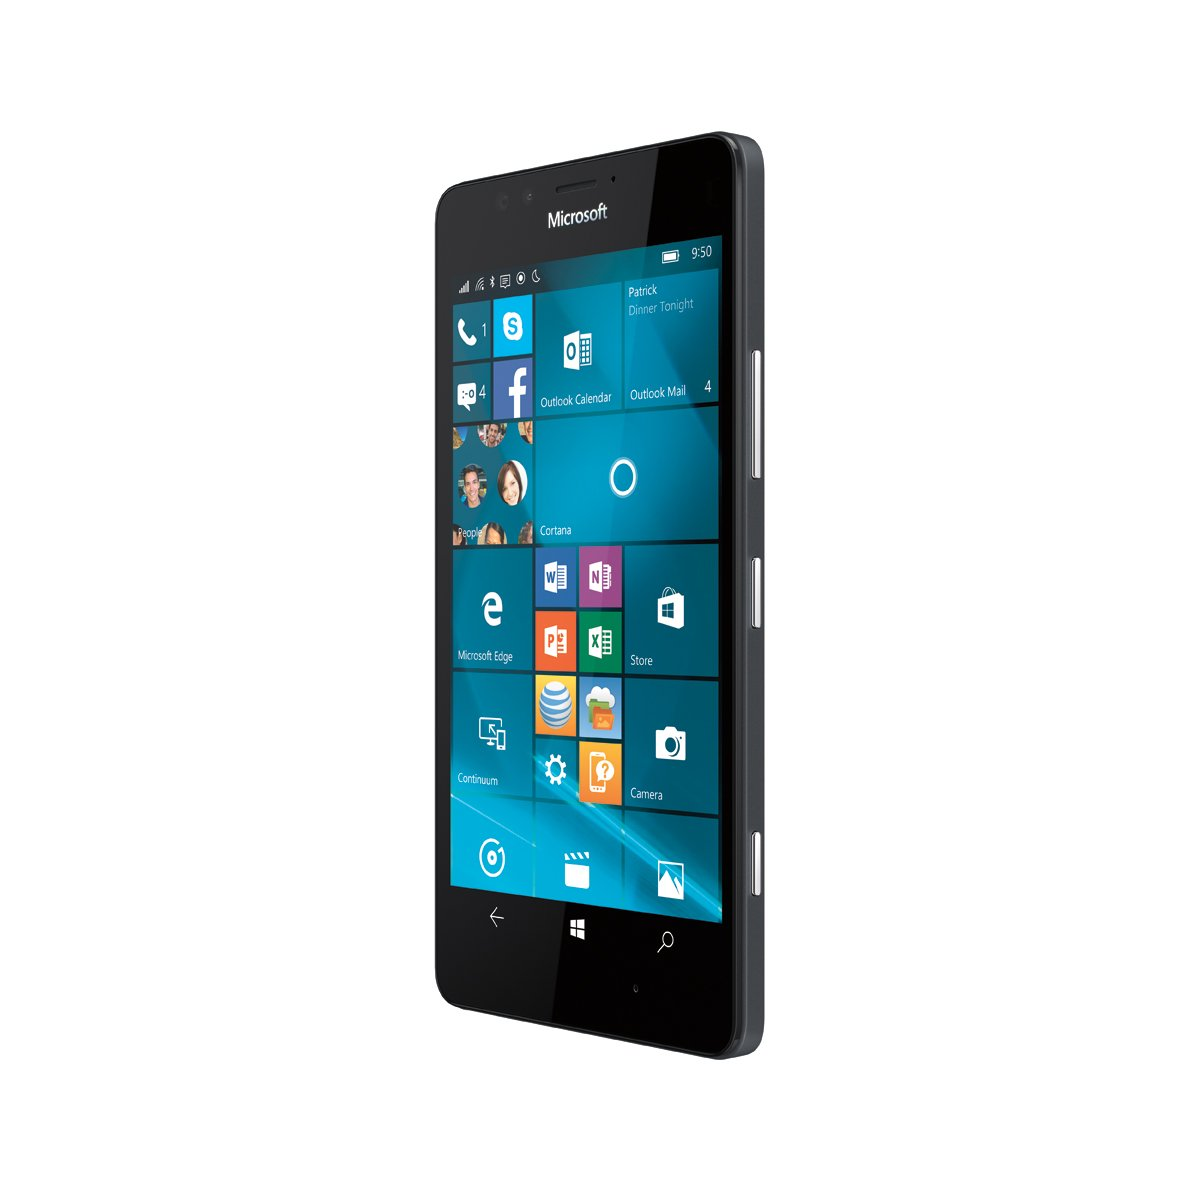 Microsoft Lumia 950, Black 32GB (AT&T) by Nokia (Image #4)